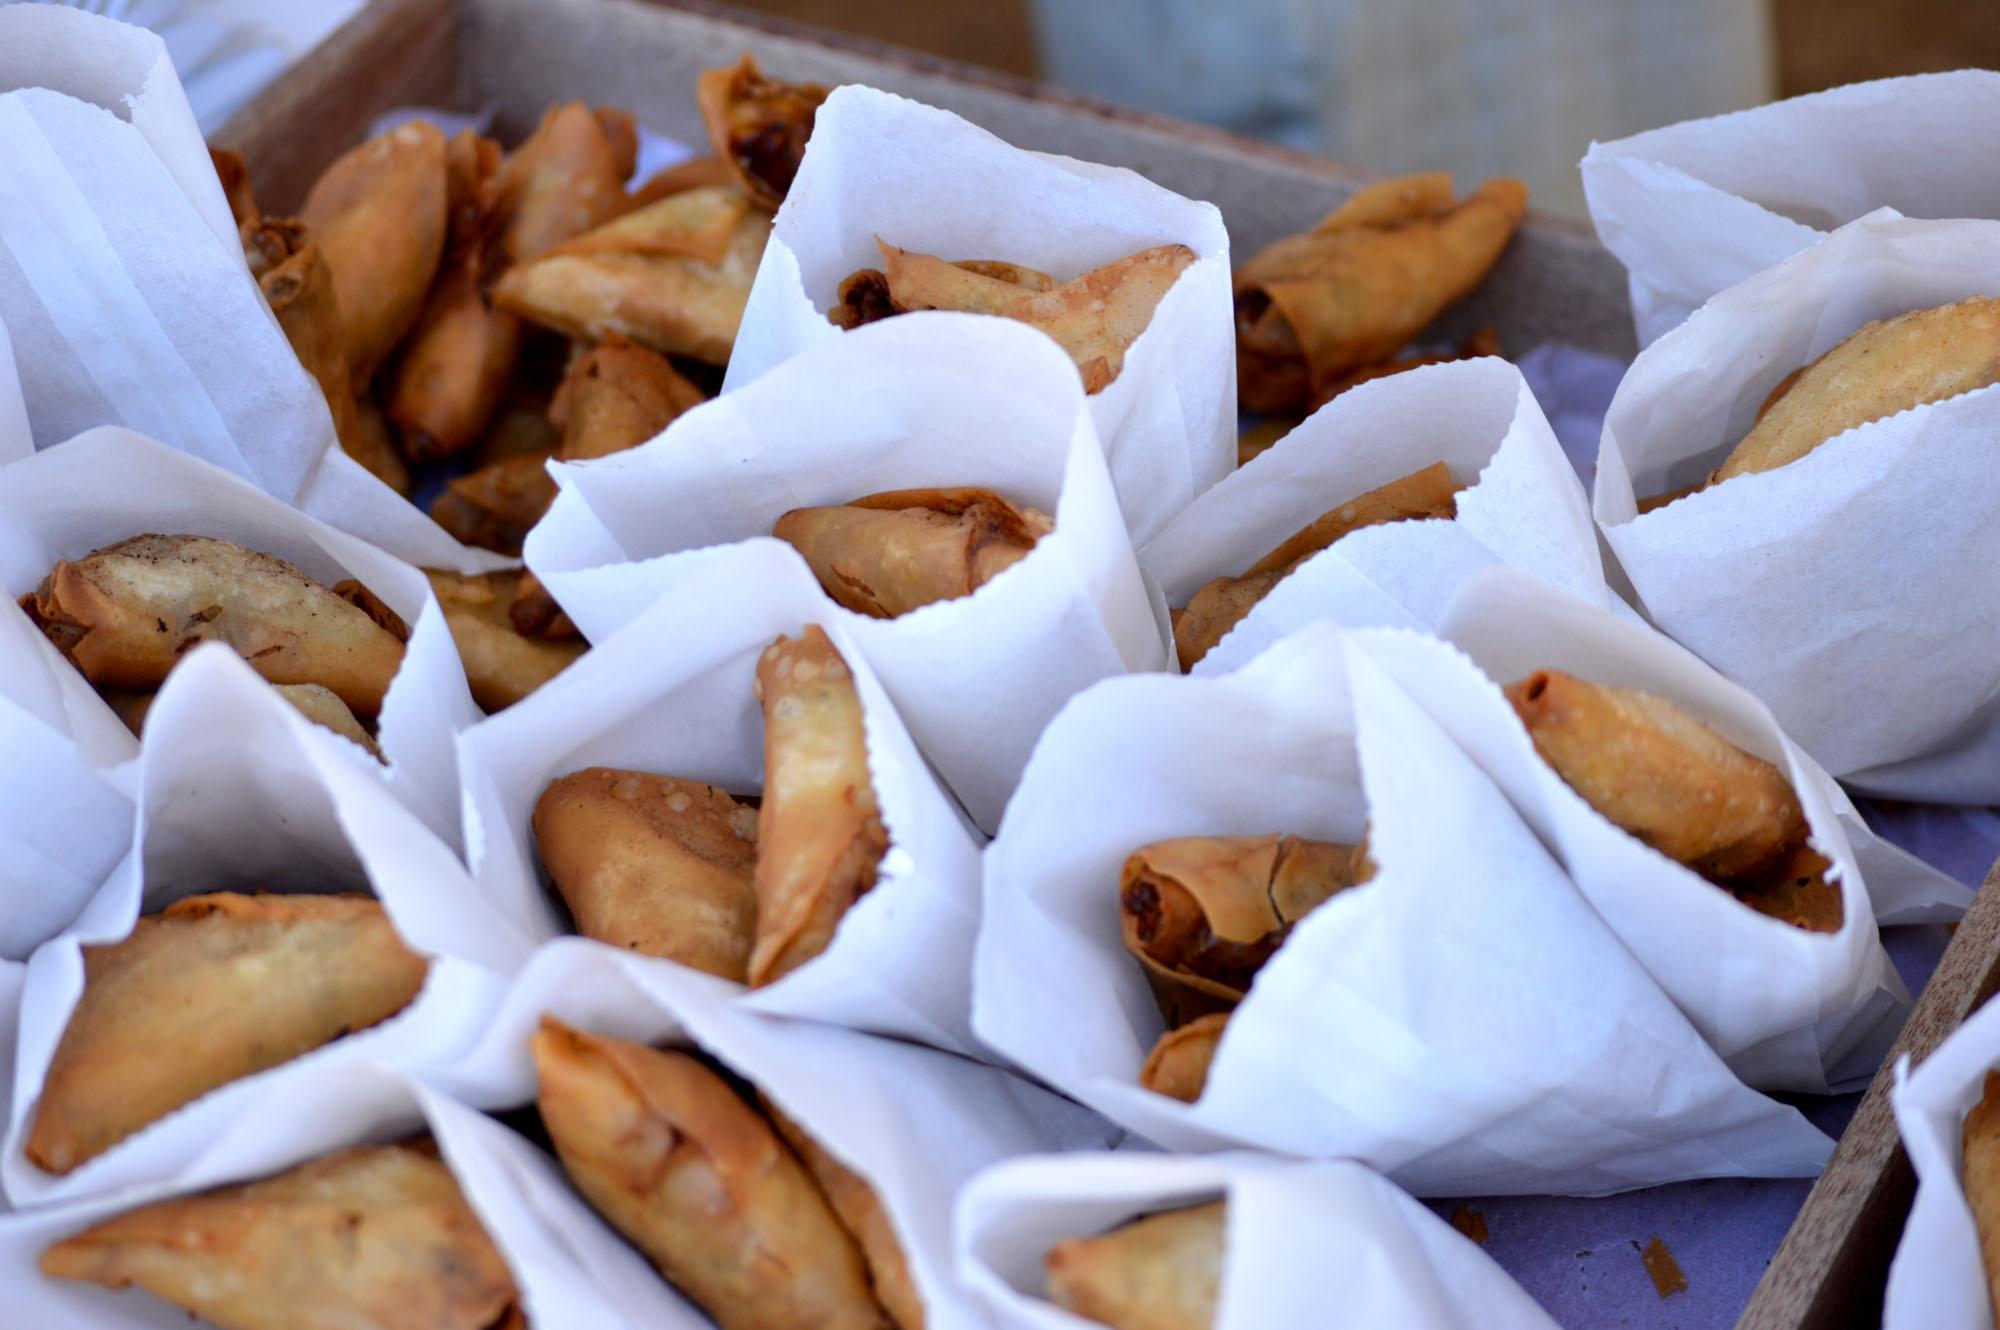 Food & Wine Tours – Cape Town City Foodie Tour